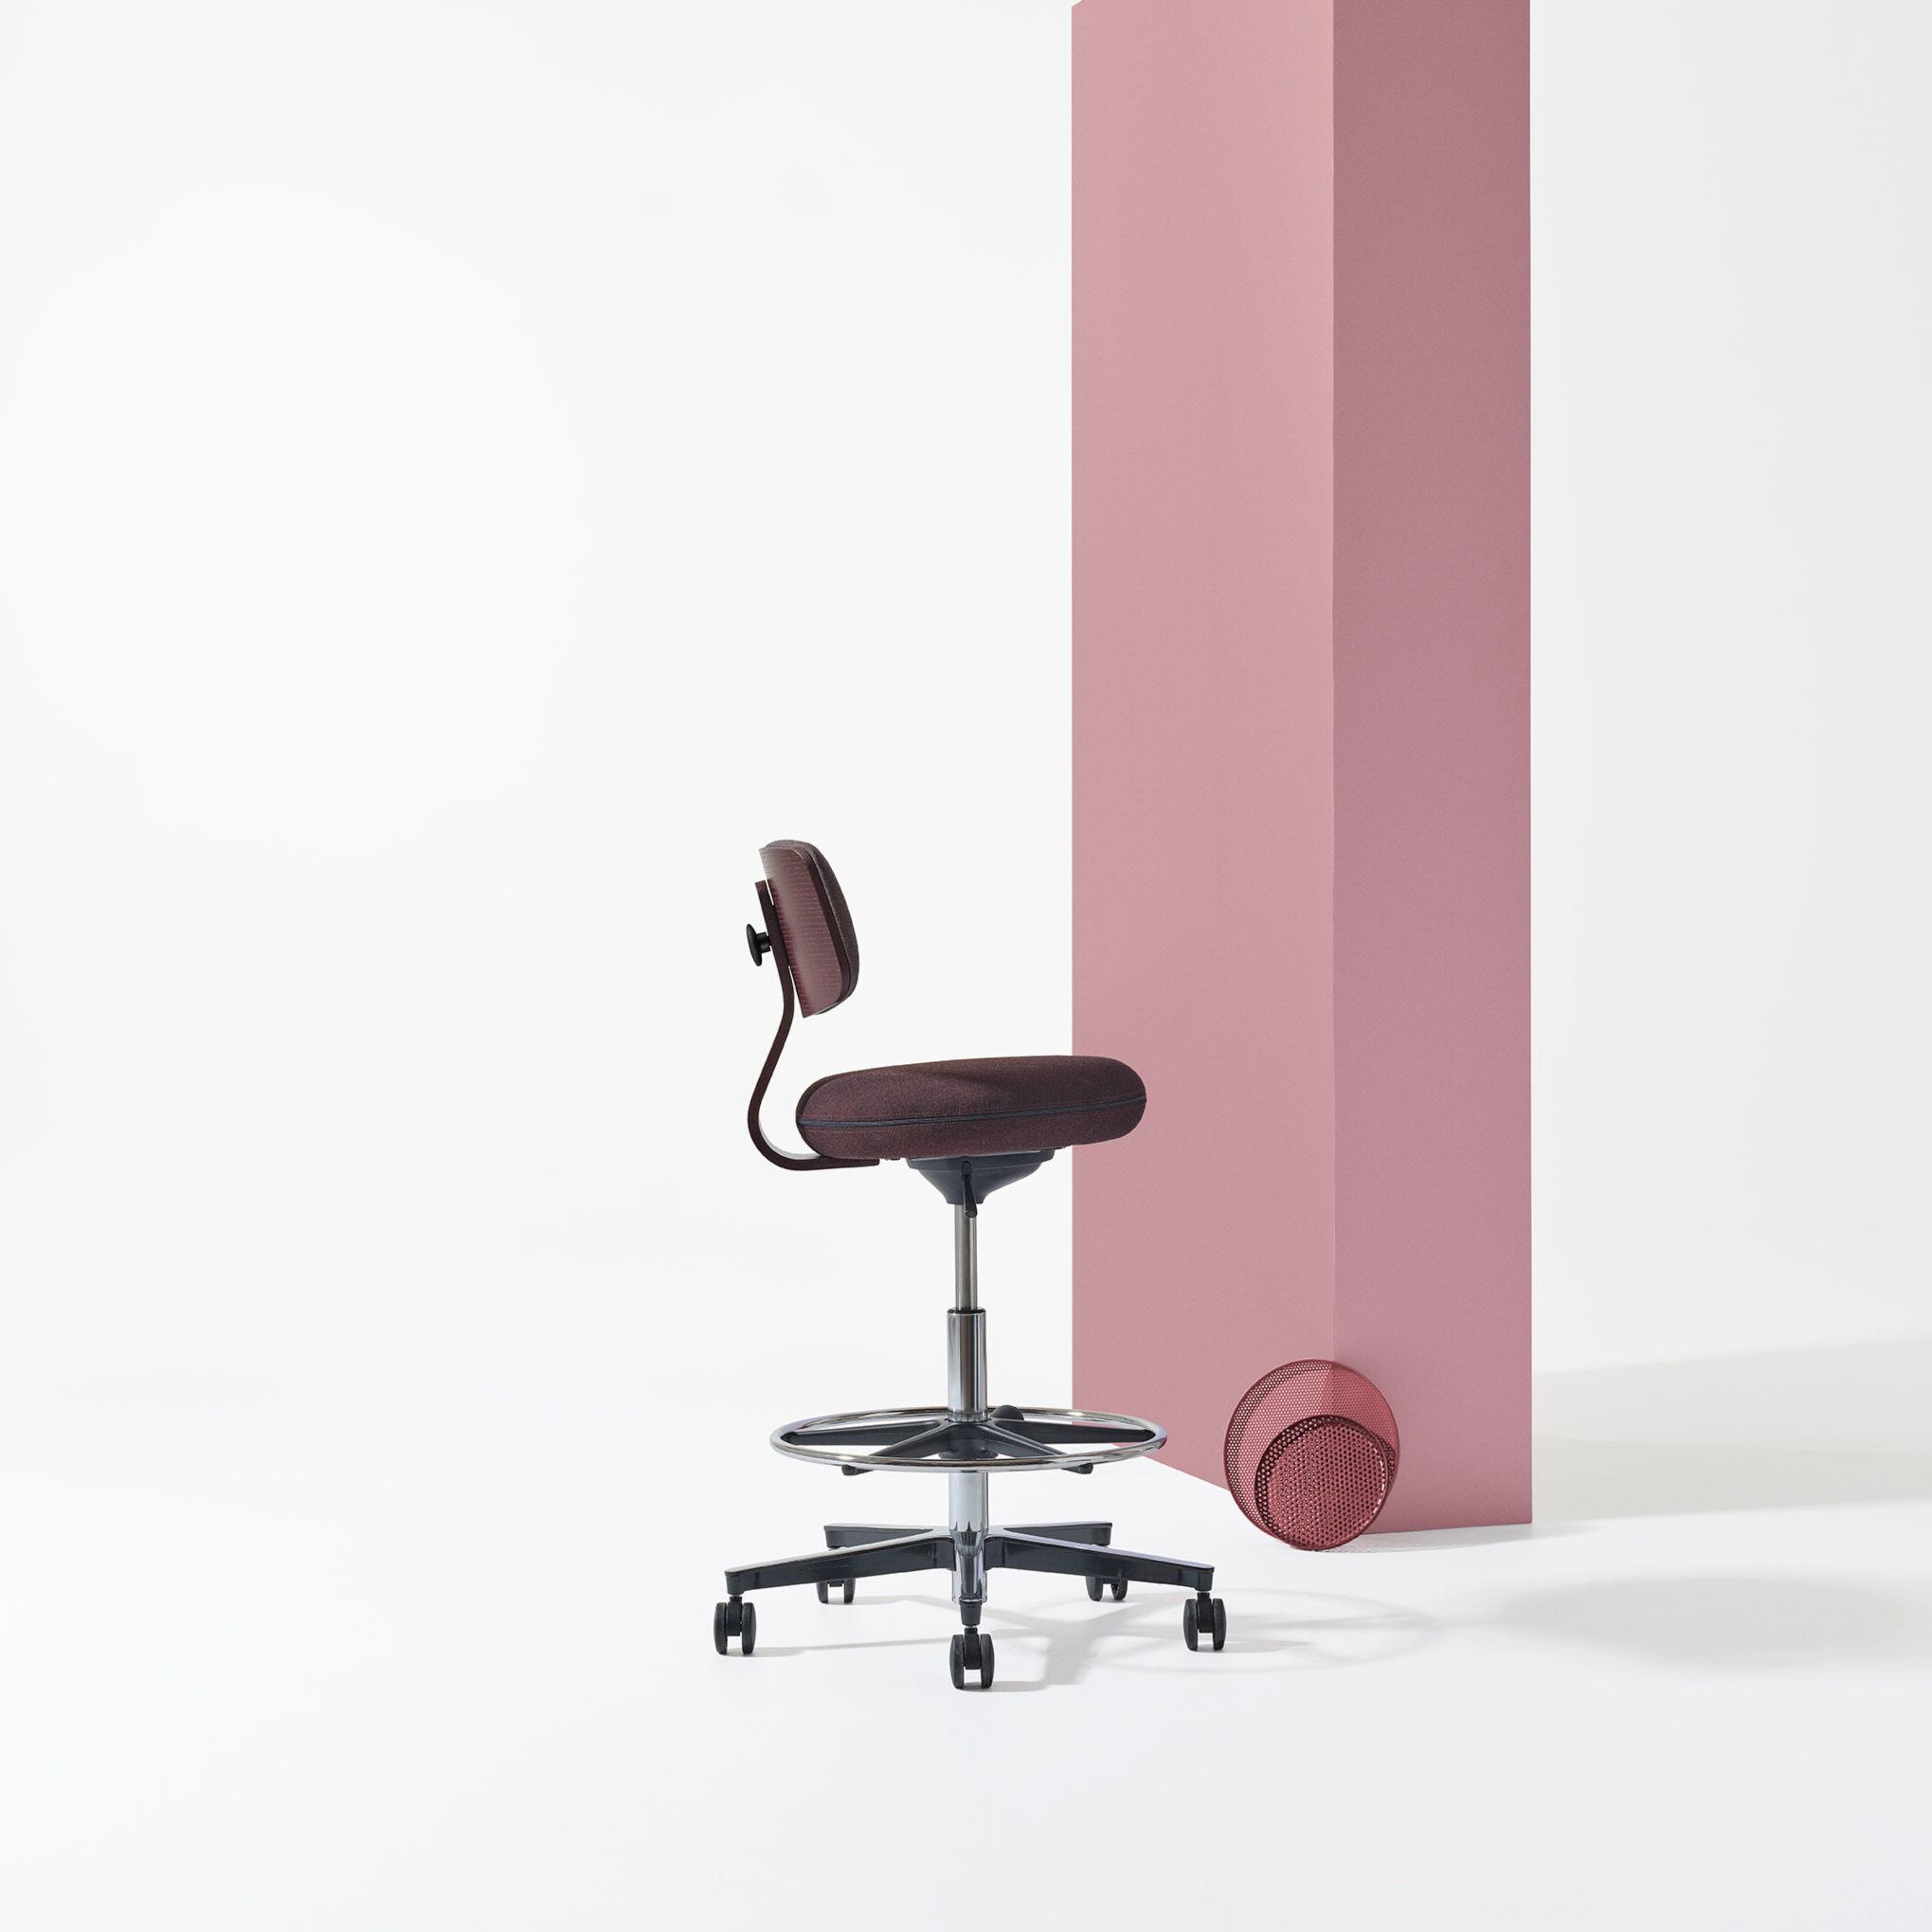 Savo 360 360 high chair product image 2